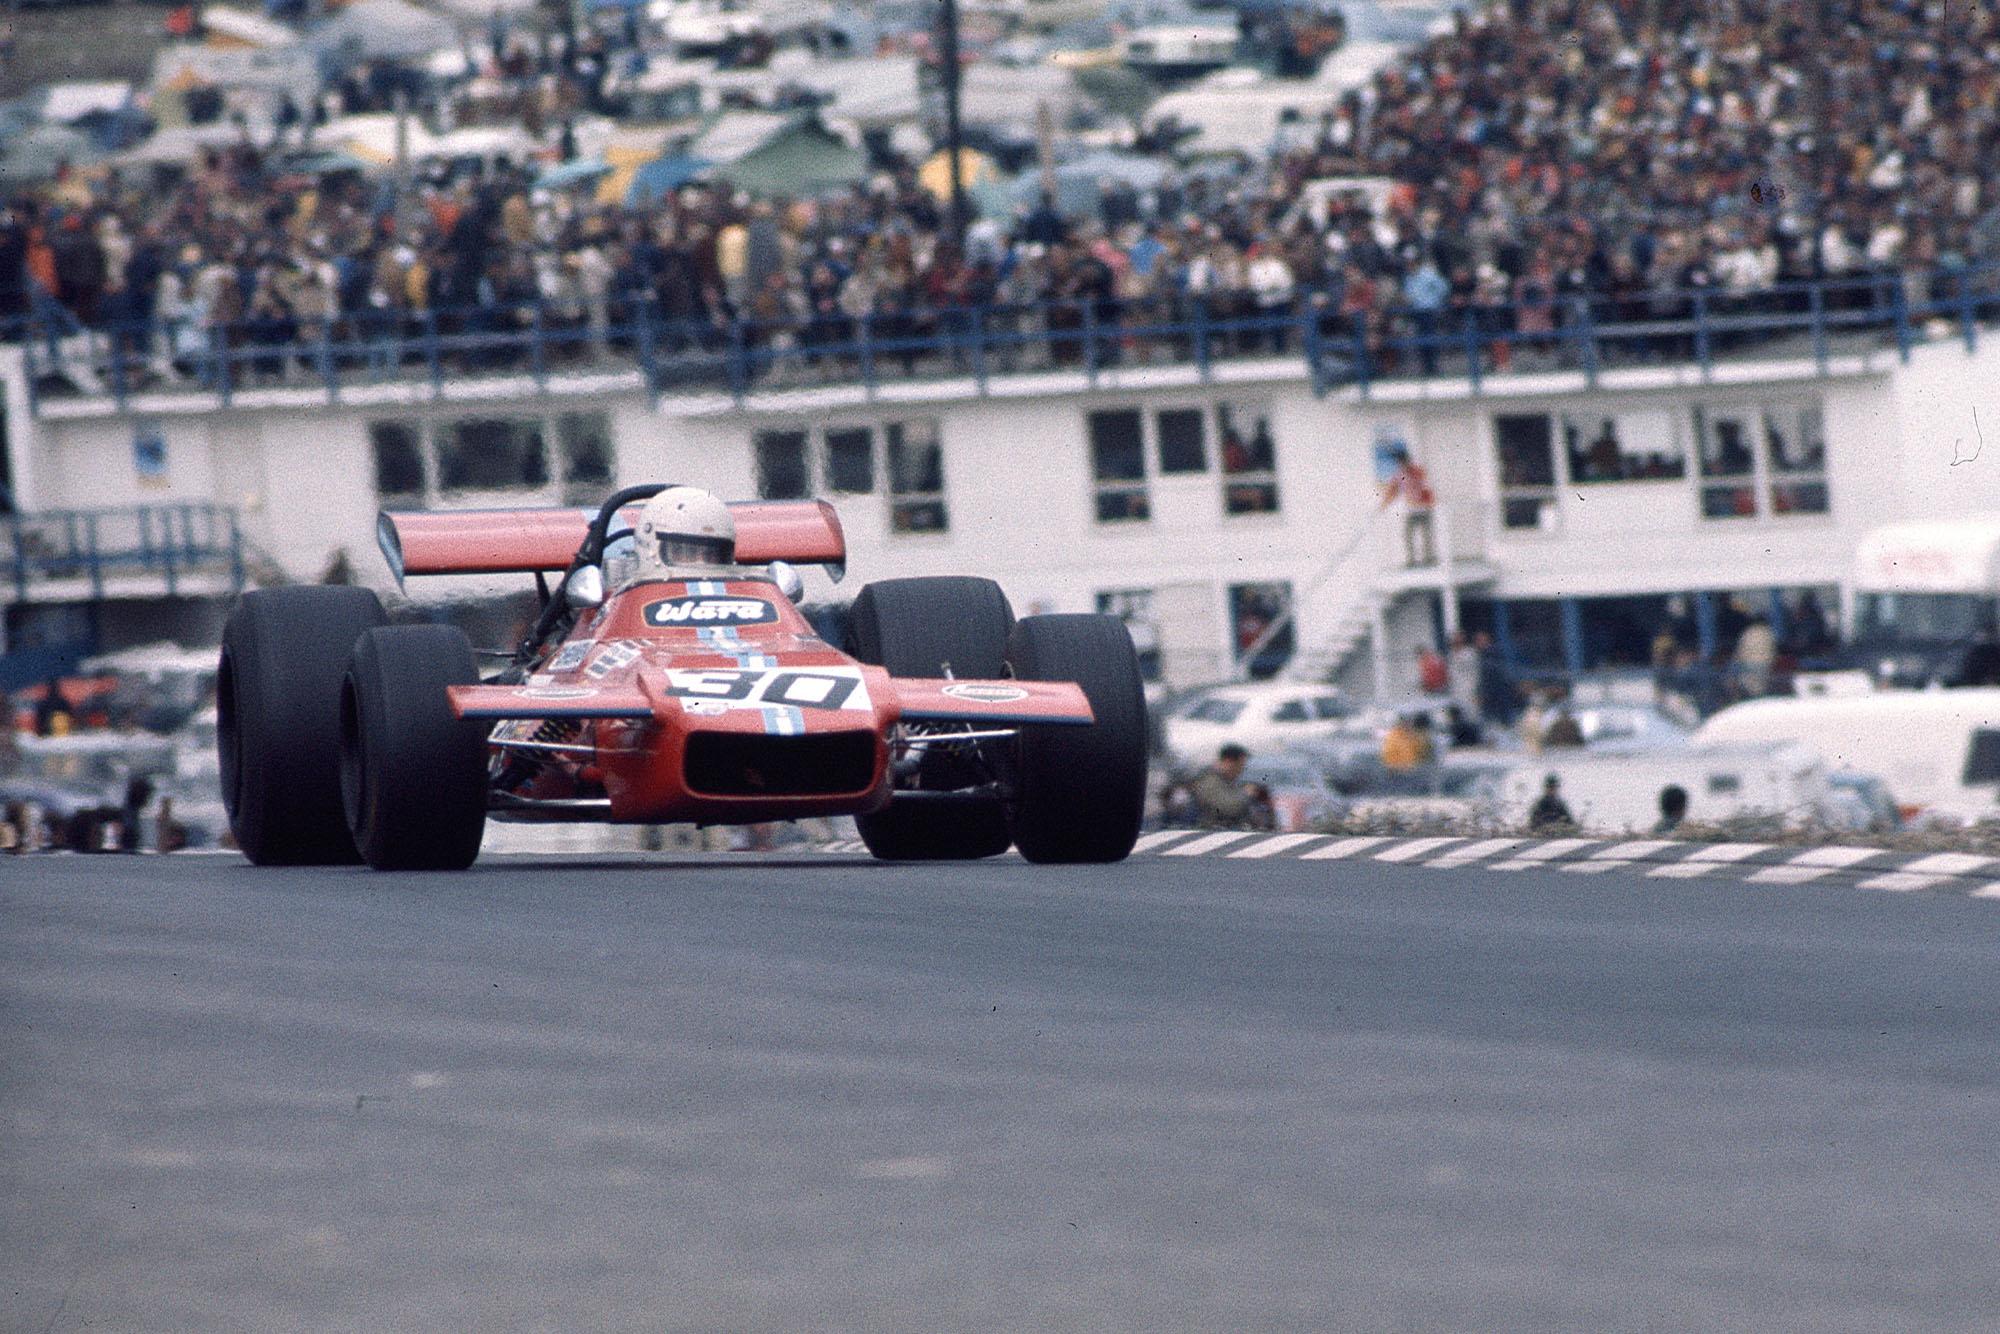 Tim Schenken driving a Frank Williams De Tomaso at the 1970 United States Grand Prix.